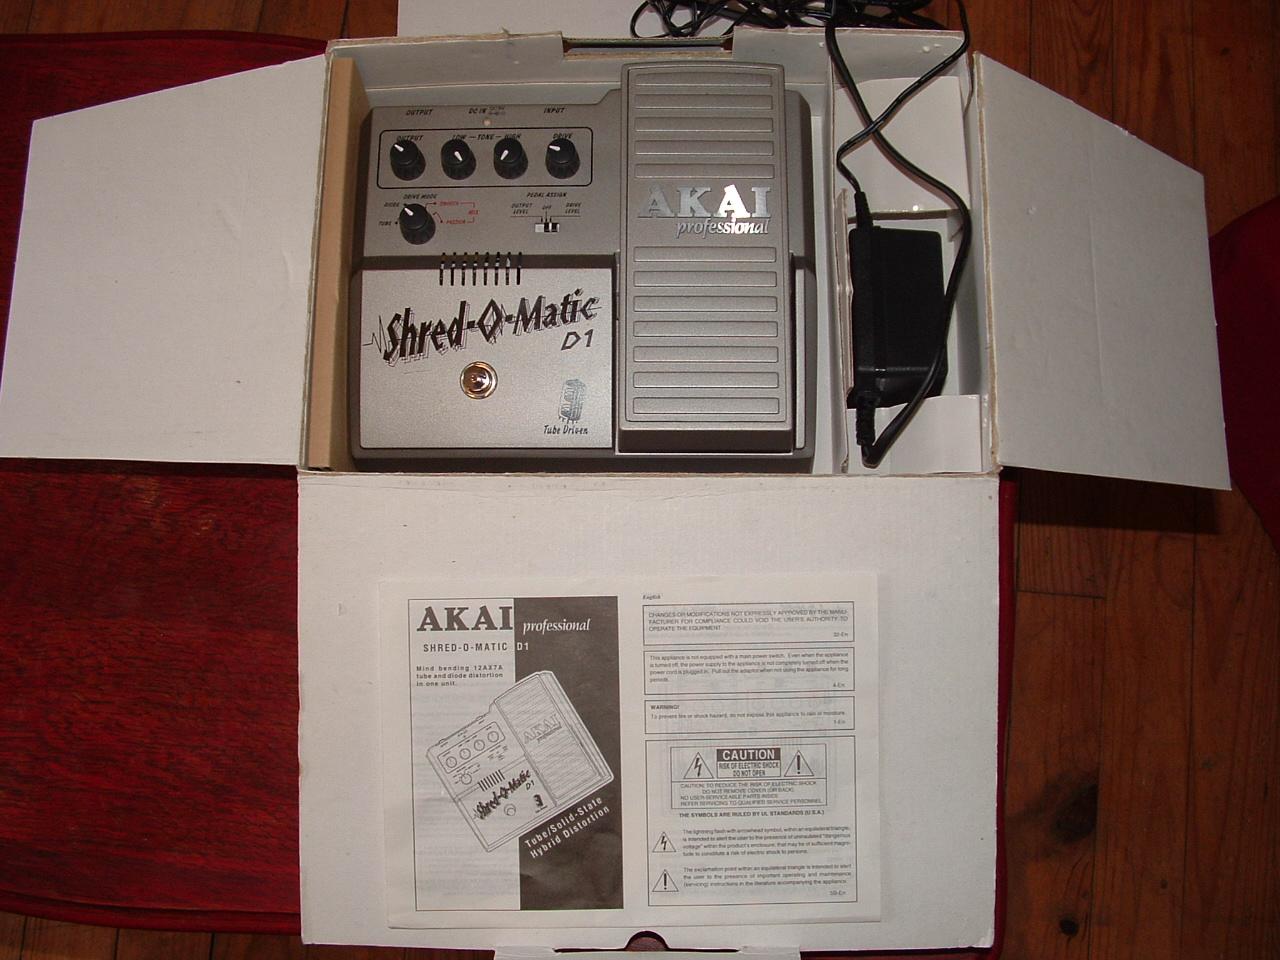 AKAI Shred-O-Matic D1 Drivers Download - Update AKAI Software